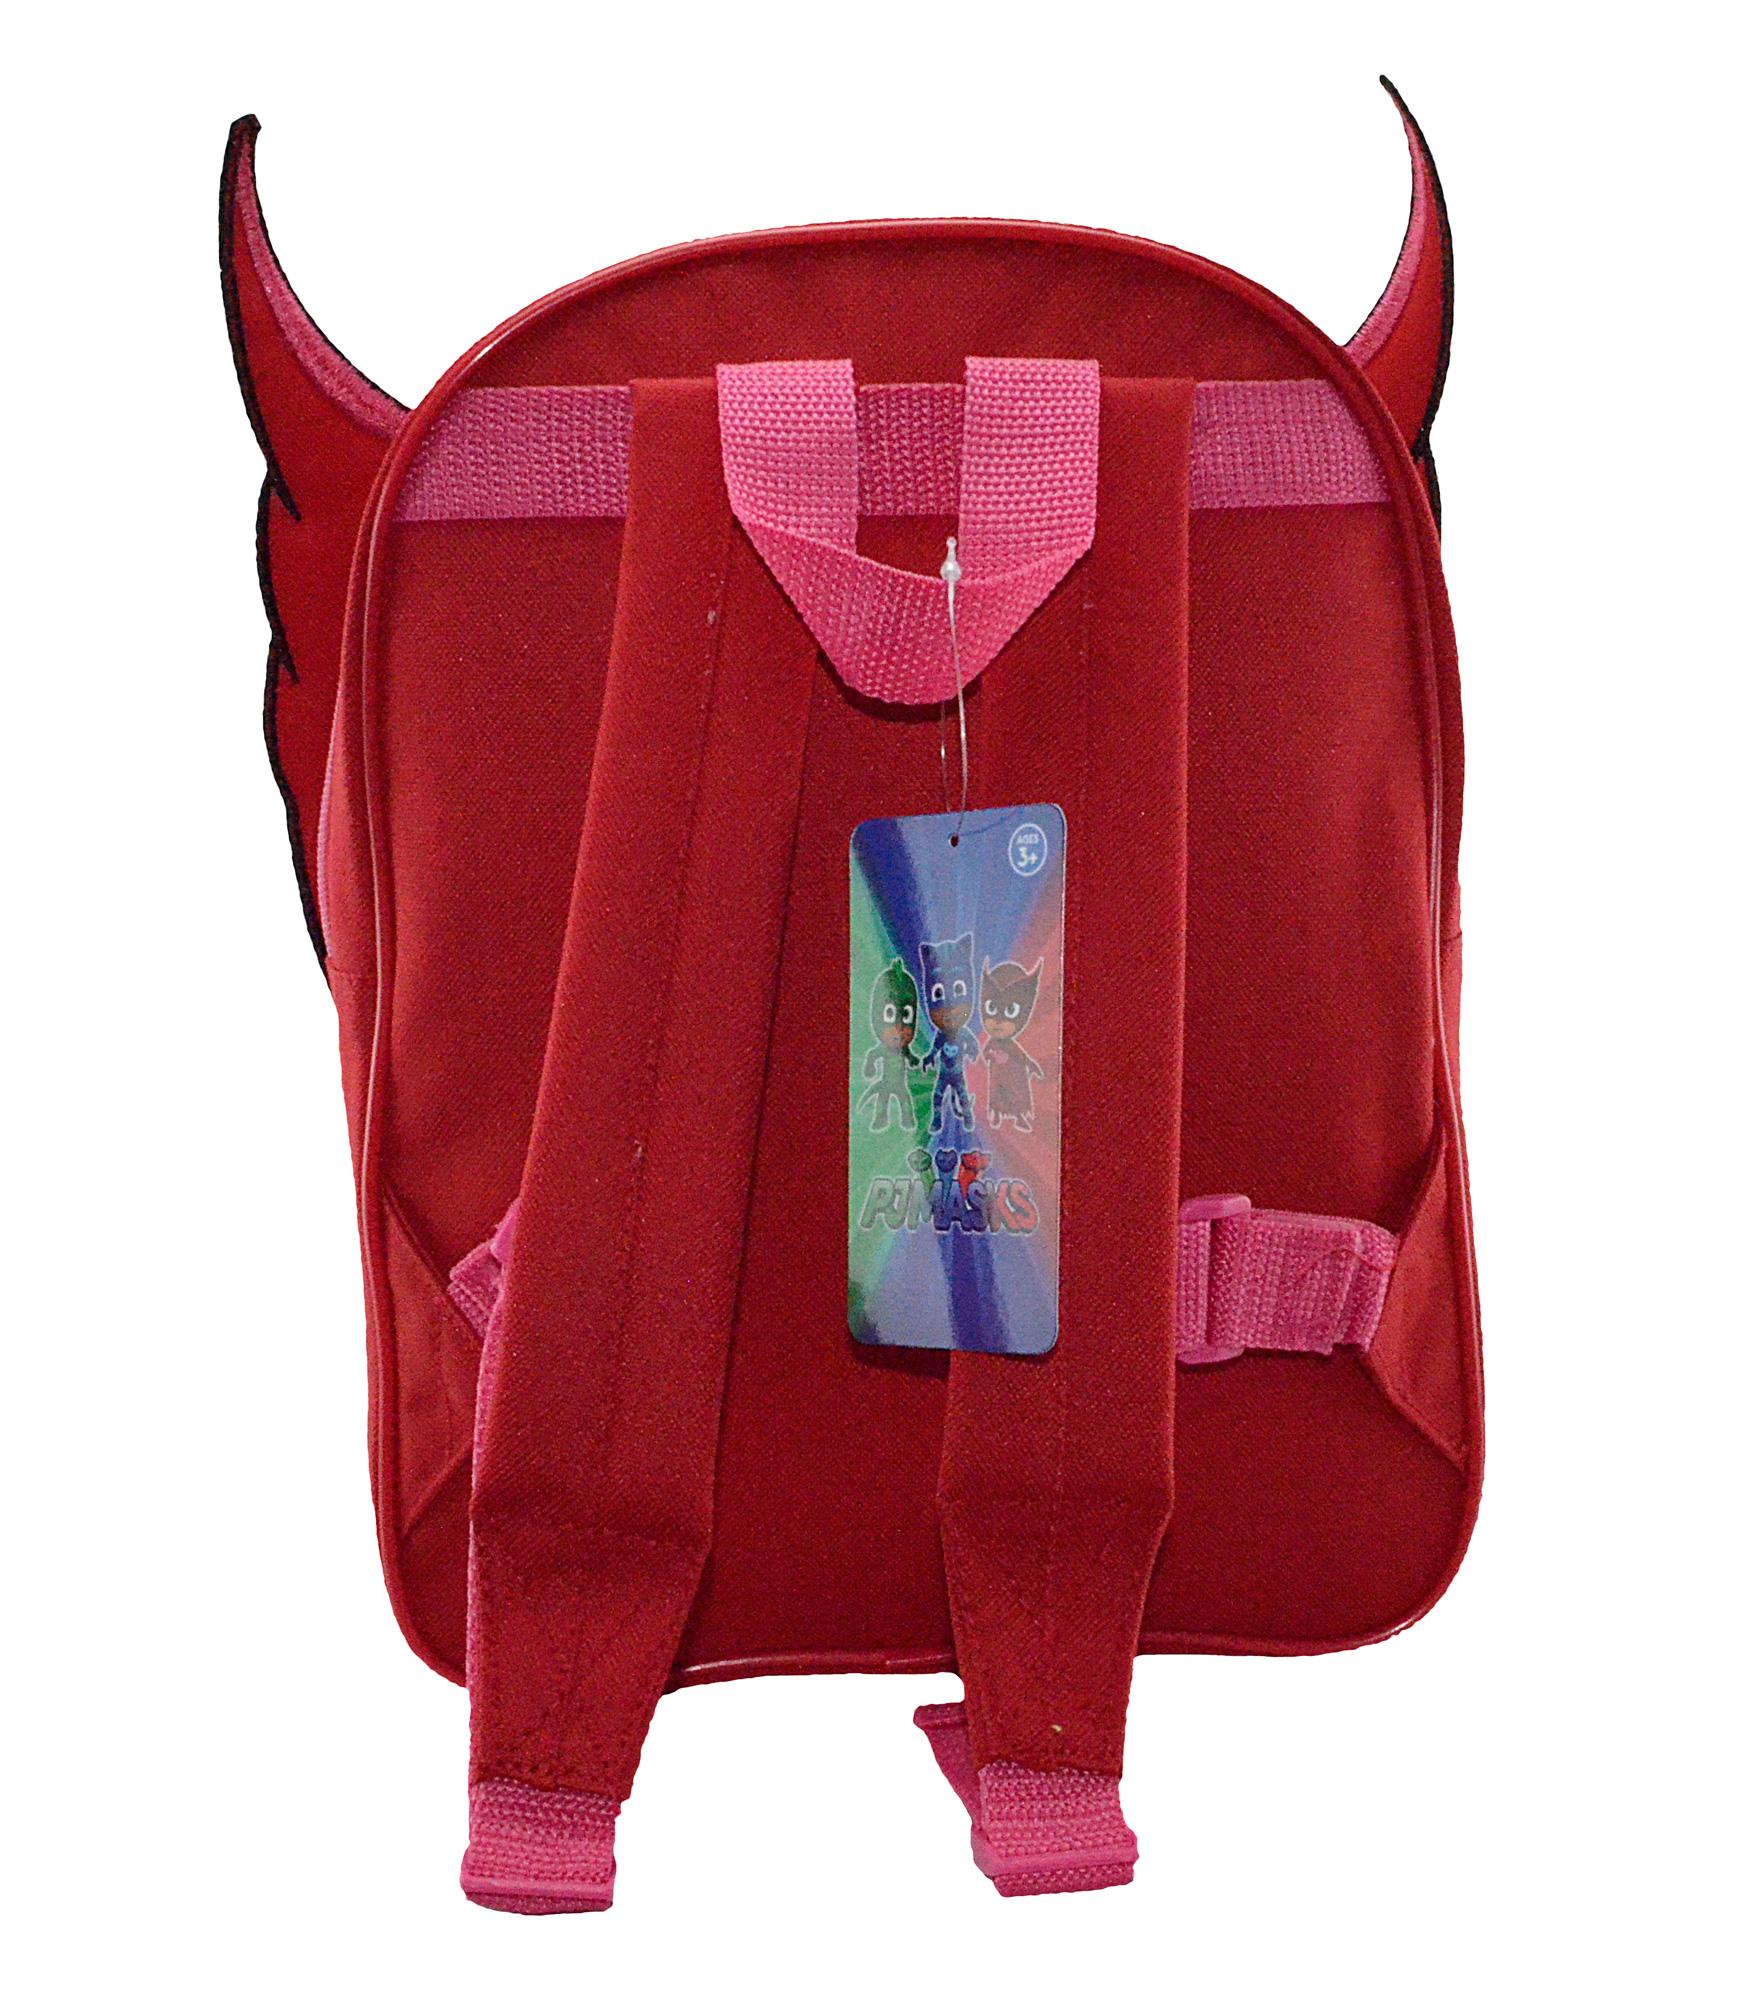 Pj Masks Owlette Novelity School Bag Rucksack Backpack